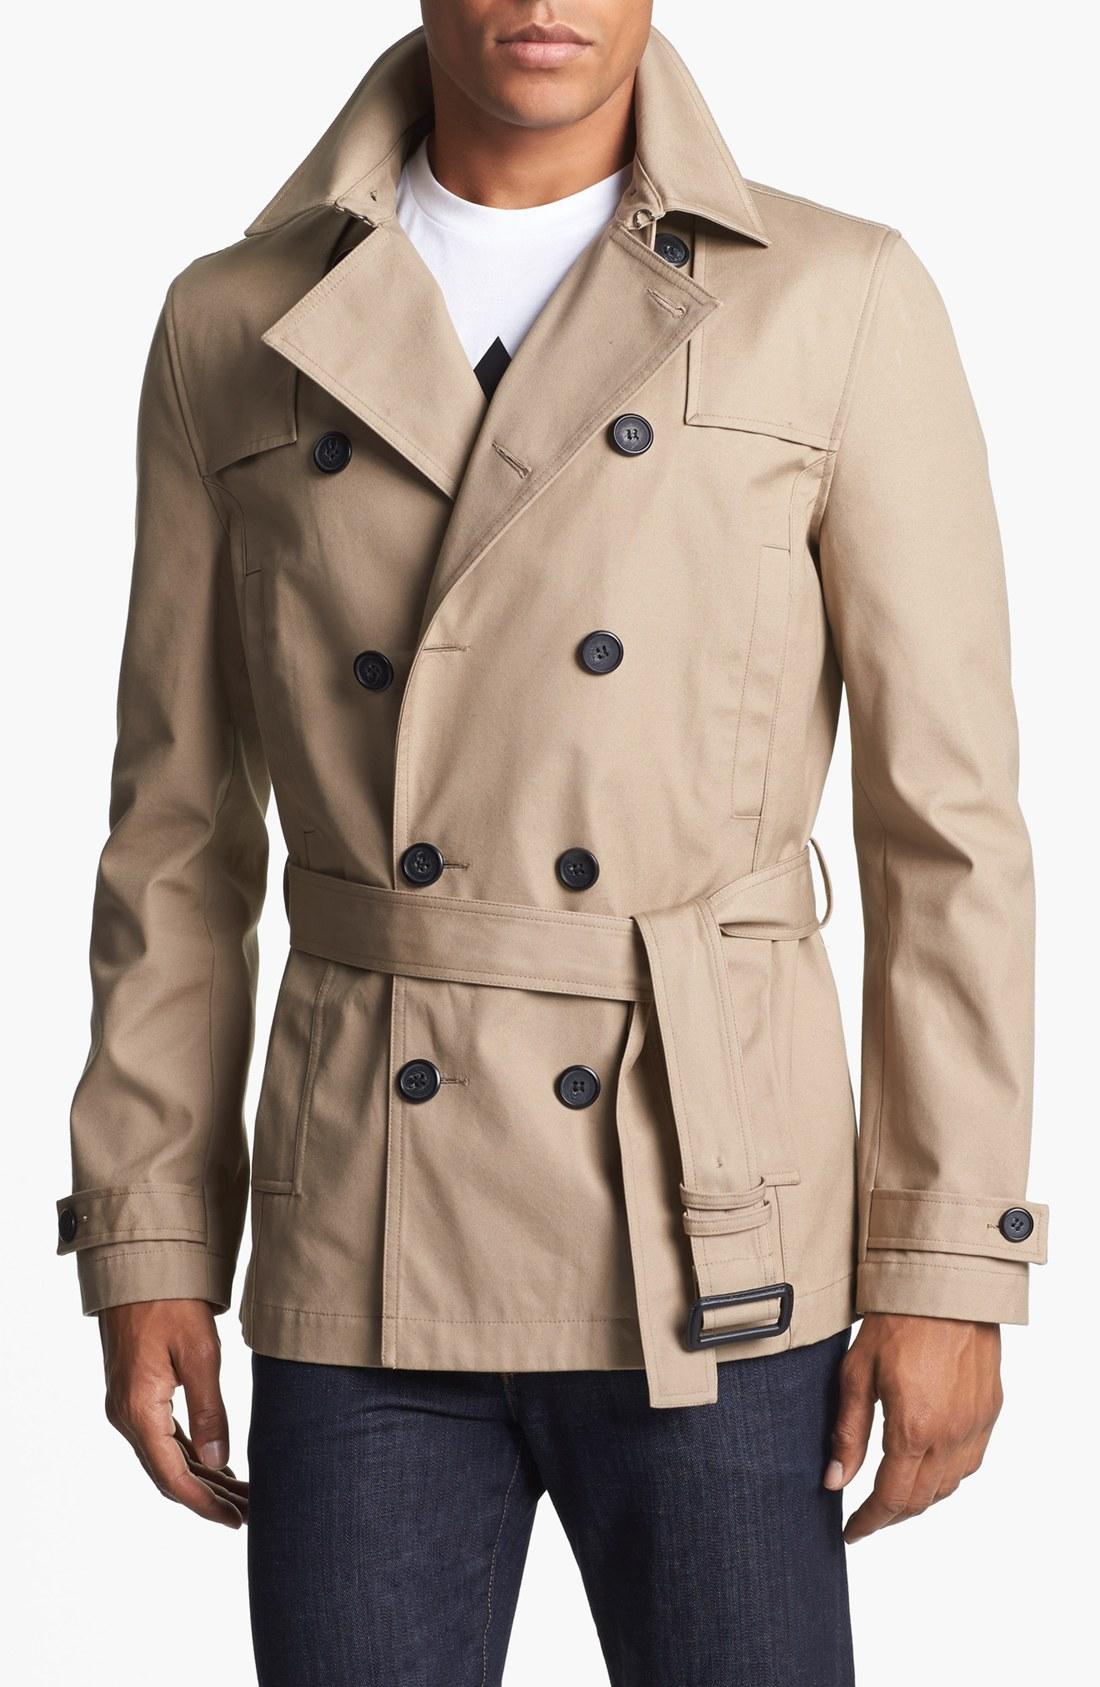 Topman Melville Short Trench Coat in Natural for Men | Lyst